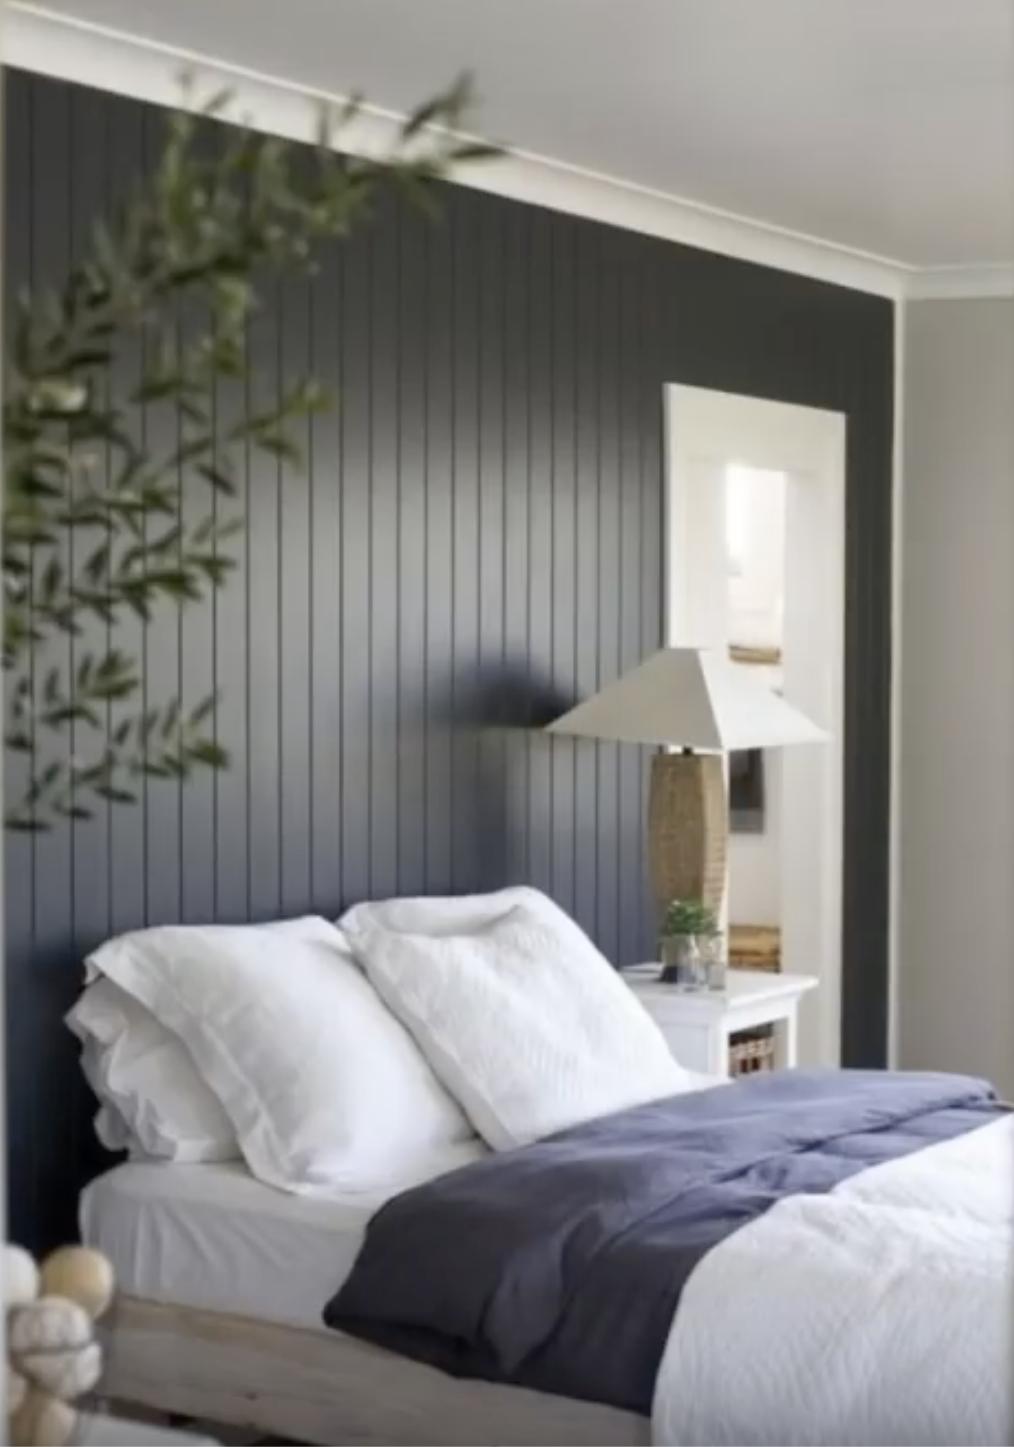 Paint beadboard dark with white trim. Bedroom panel